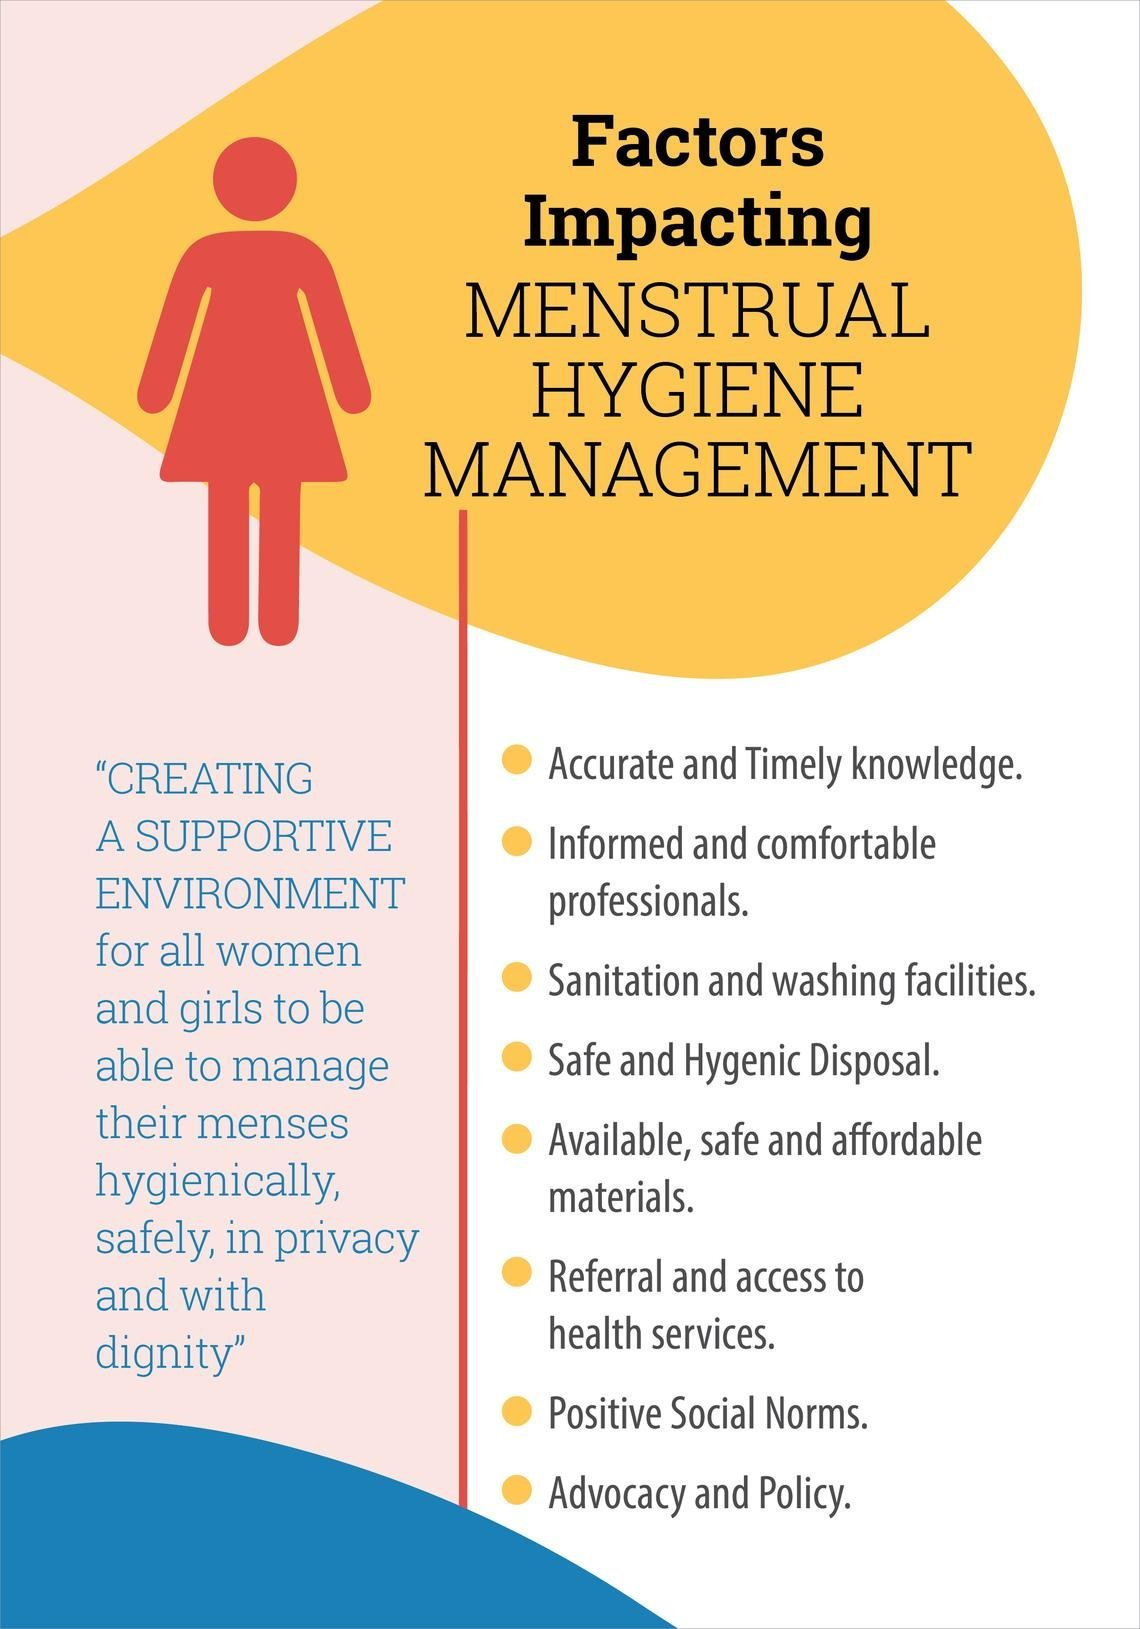 6 ways to maintain good menstrual hygiene